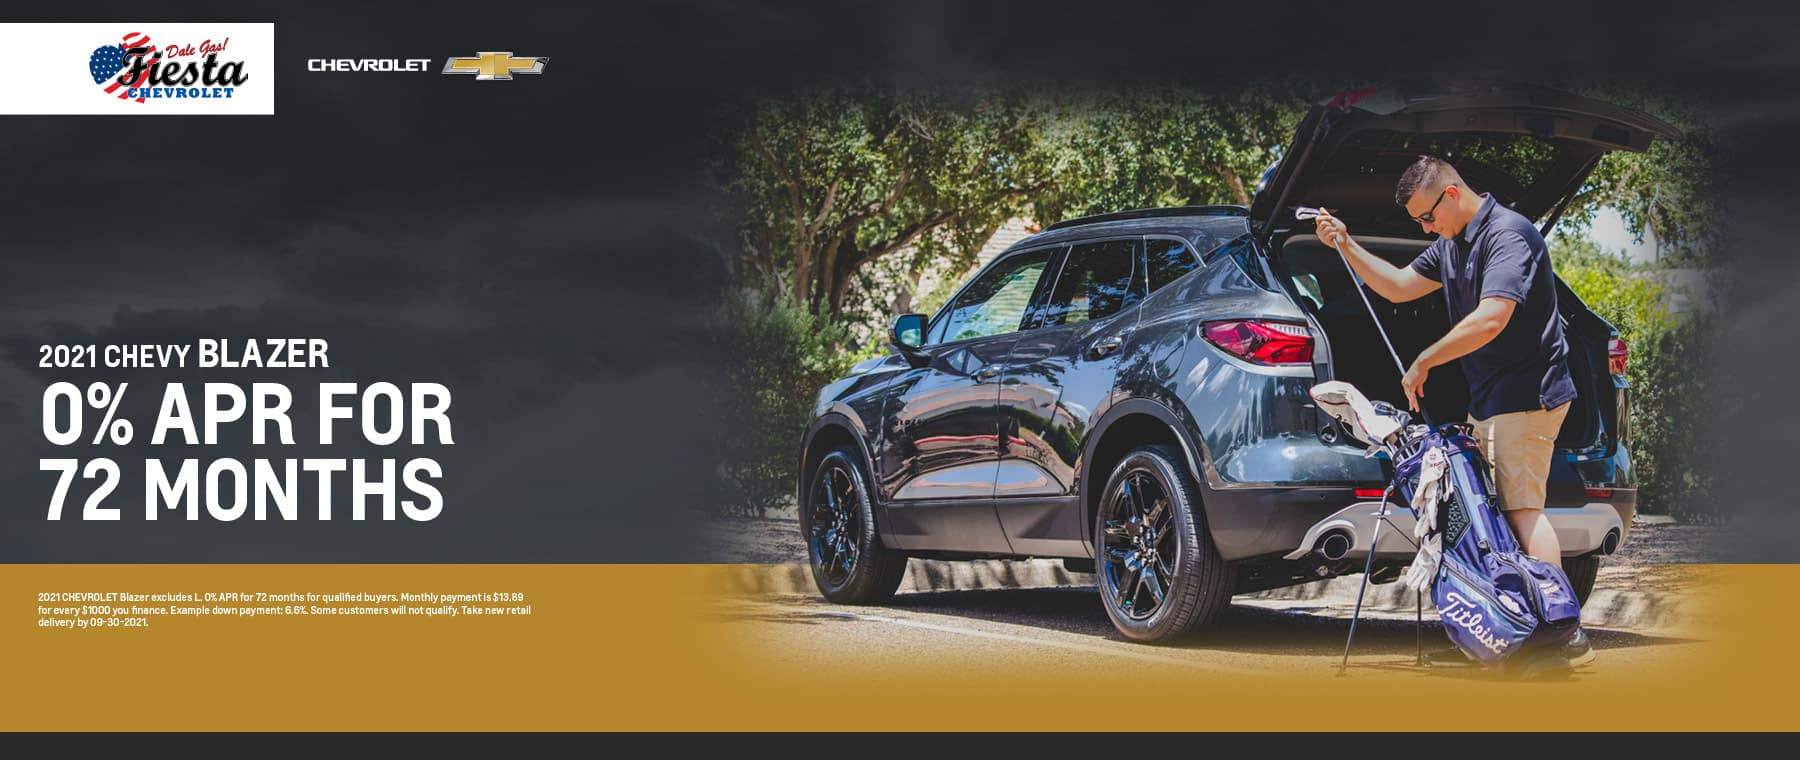 2021 Chevrolet Blazer APR Offer | Fiesta Chevrolet in Edinburg, Texas